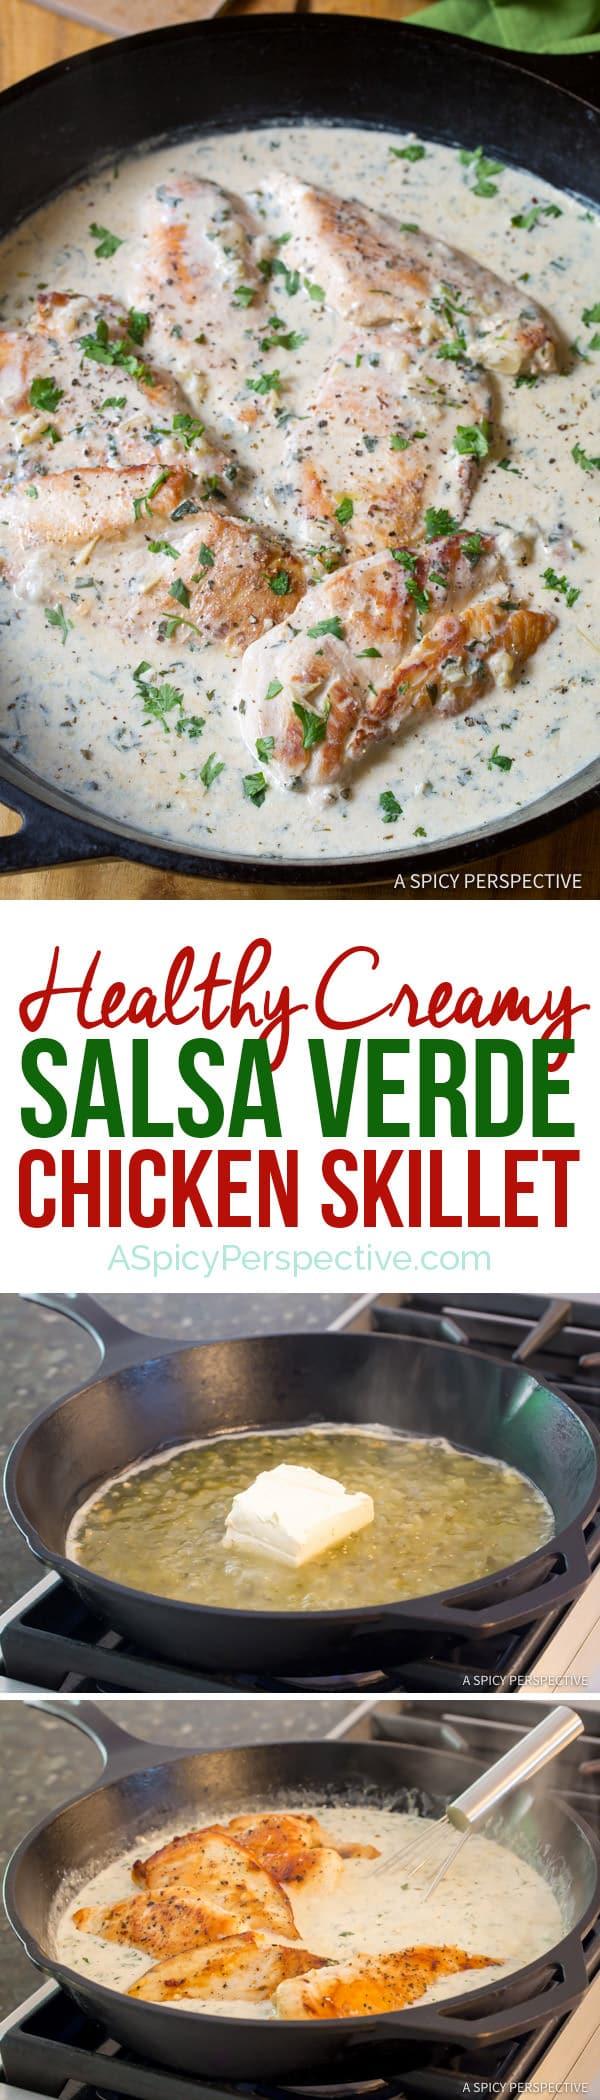 Crazy over this Healthy Creamy Salsa Verde Chicken Skillet Recipe   ASpicyPerspective.com